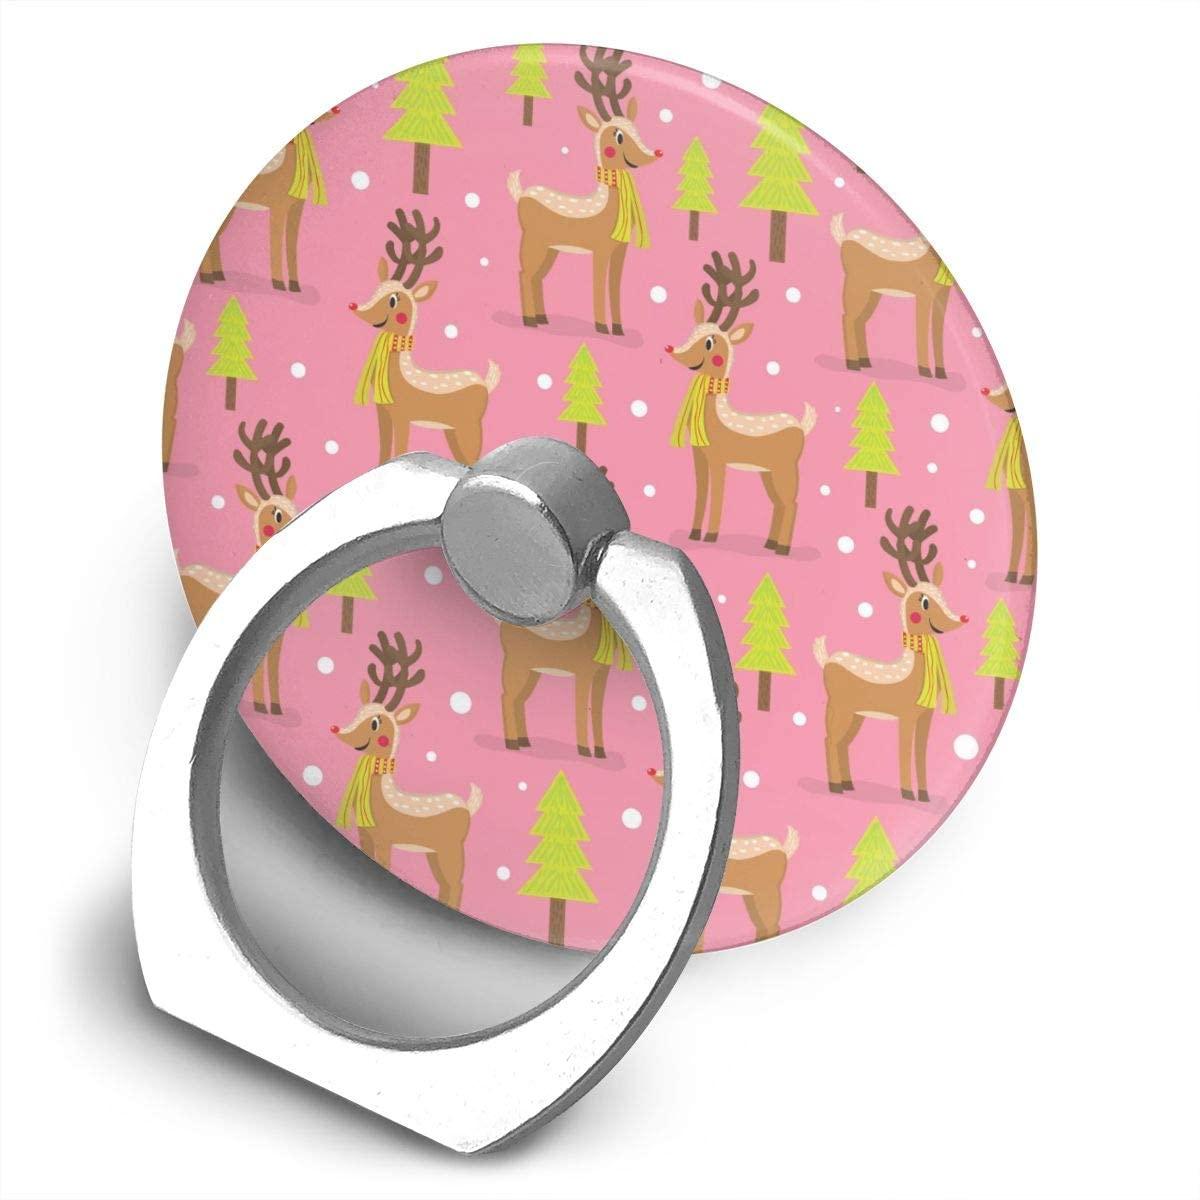 Cell Phone Ring Holder Stand Christmas Tree Cute Deer Pink Adjustable 360°Rotation Round Universal Finger Grip Loop Kickstand with Silver Metal Phone Holder for Women Kids Men Ladies Smartphones